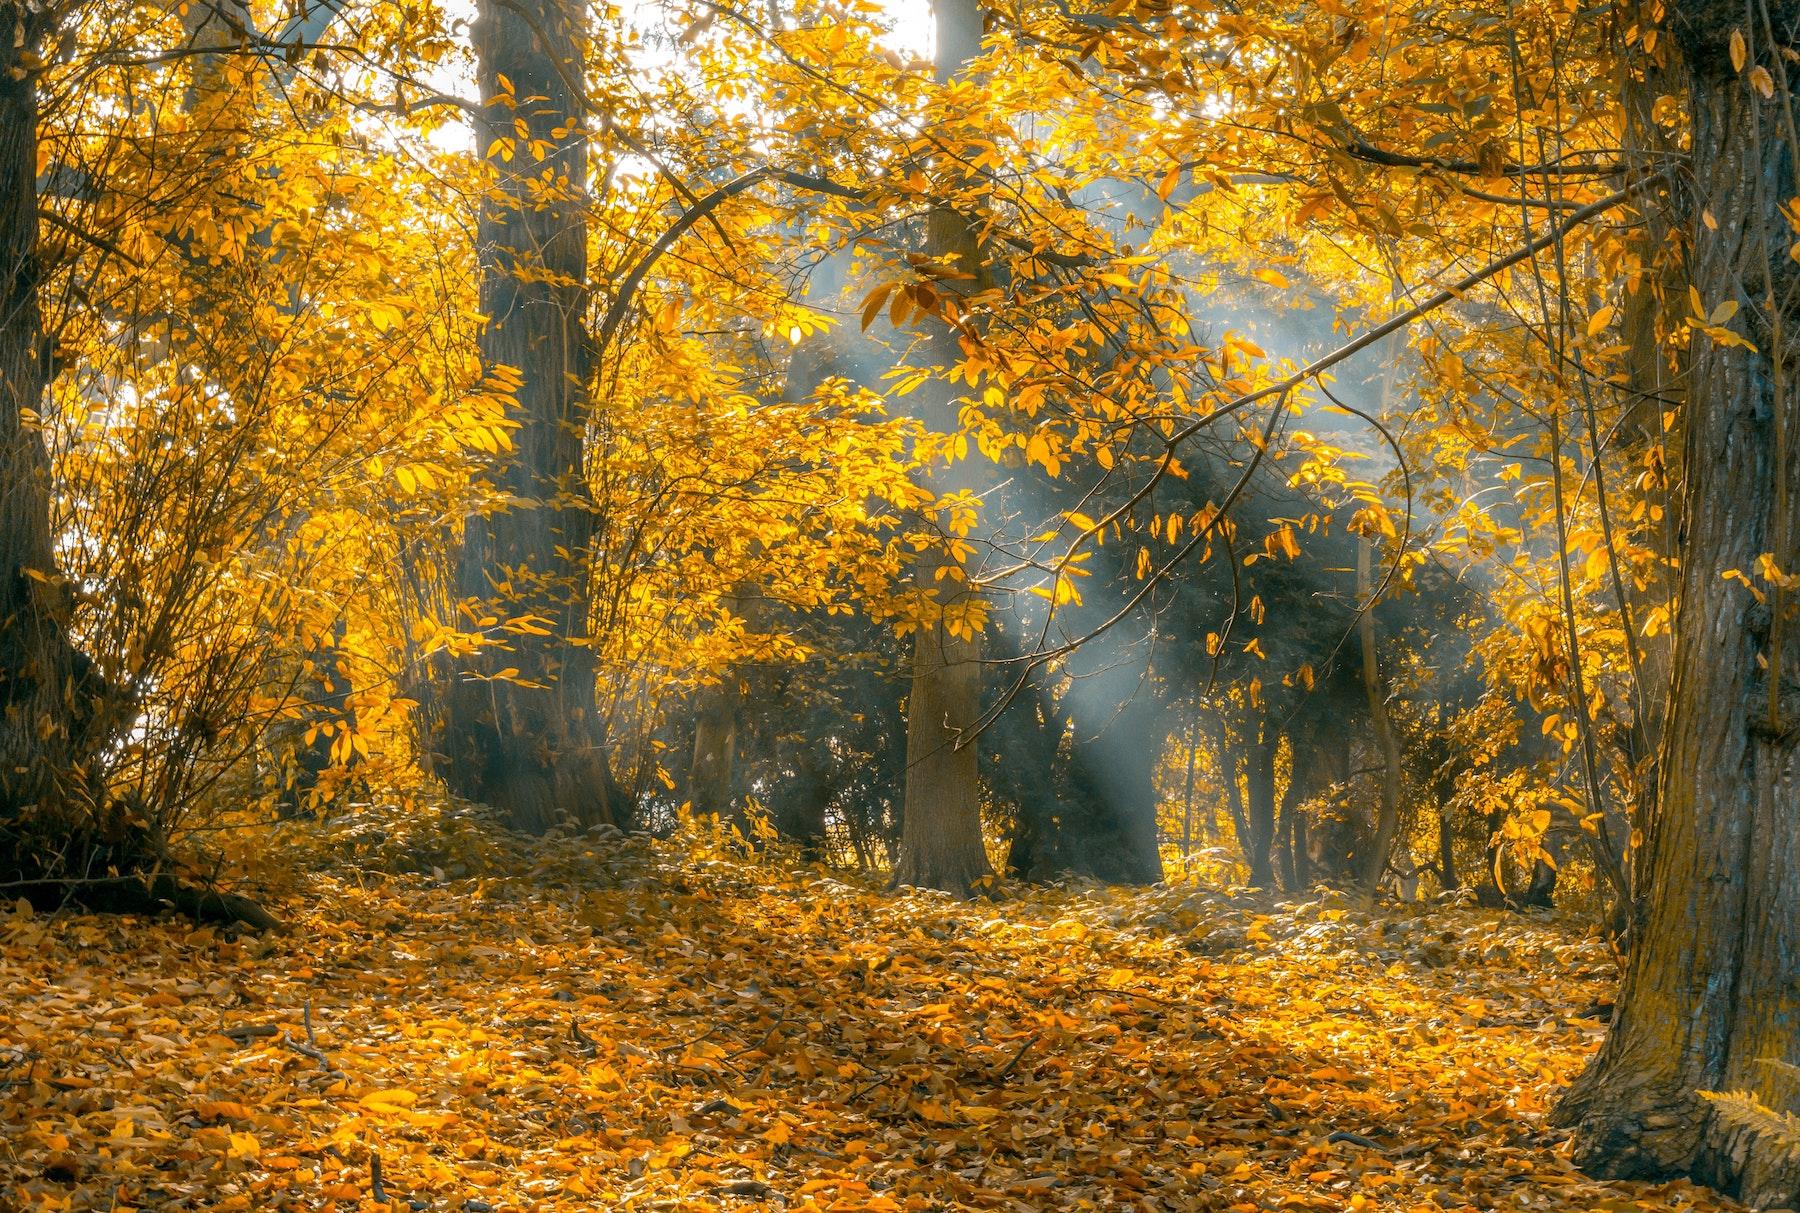 autumn-autumn-leaves-branch-531857